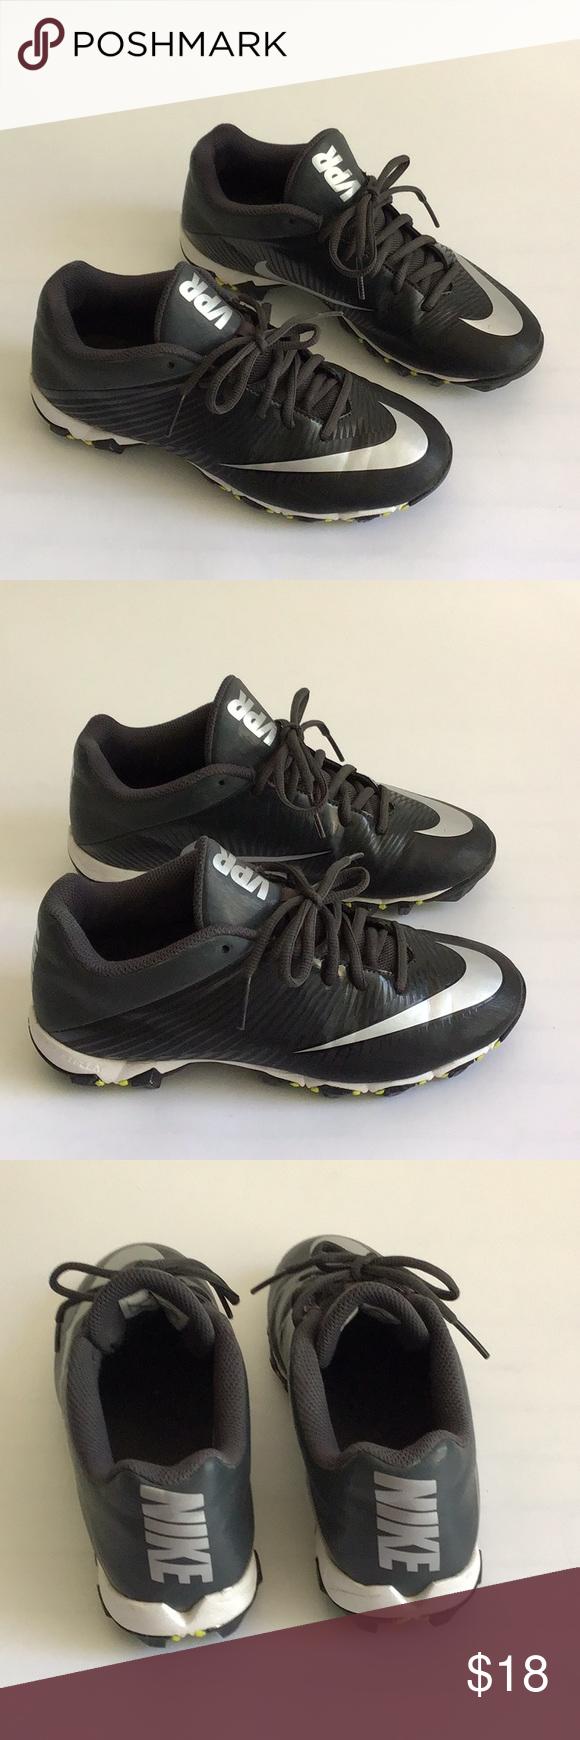 Nike FOOTBALL Cleats Big boys Shoes